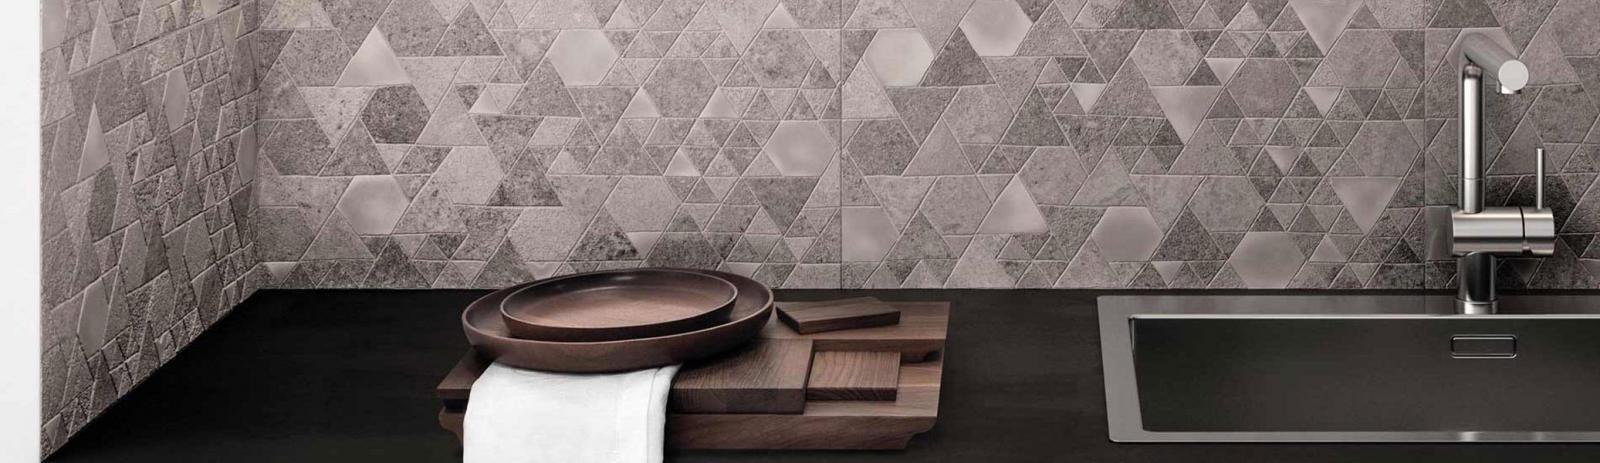 banner-freedom-3d-stone-look-deco-floor-wall-tile-ceramiche-piemme